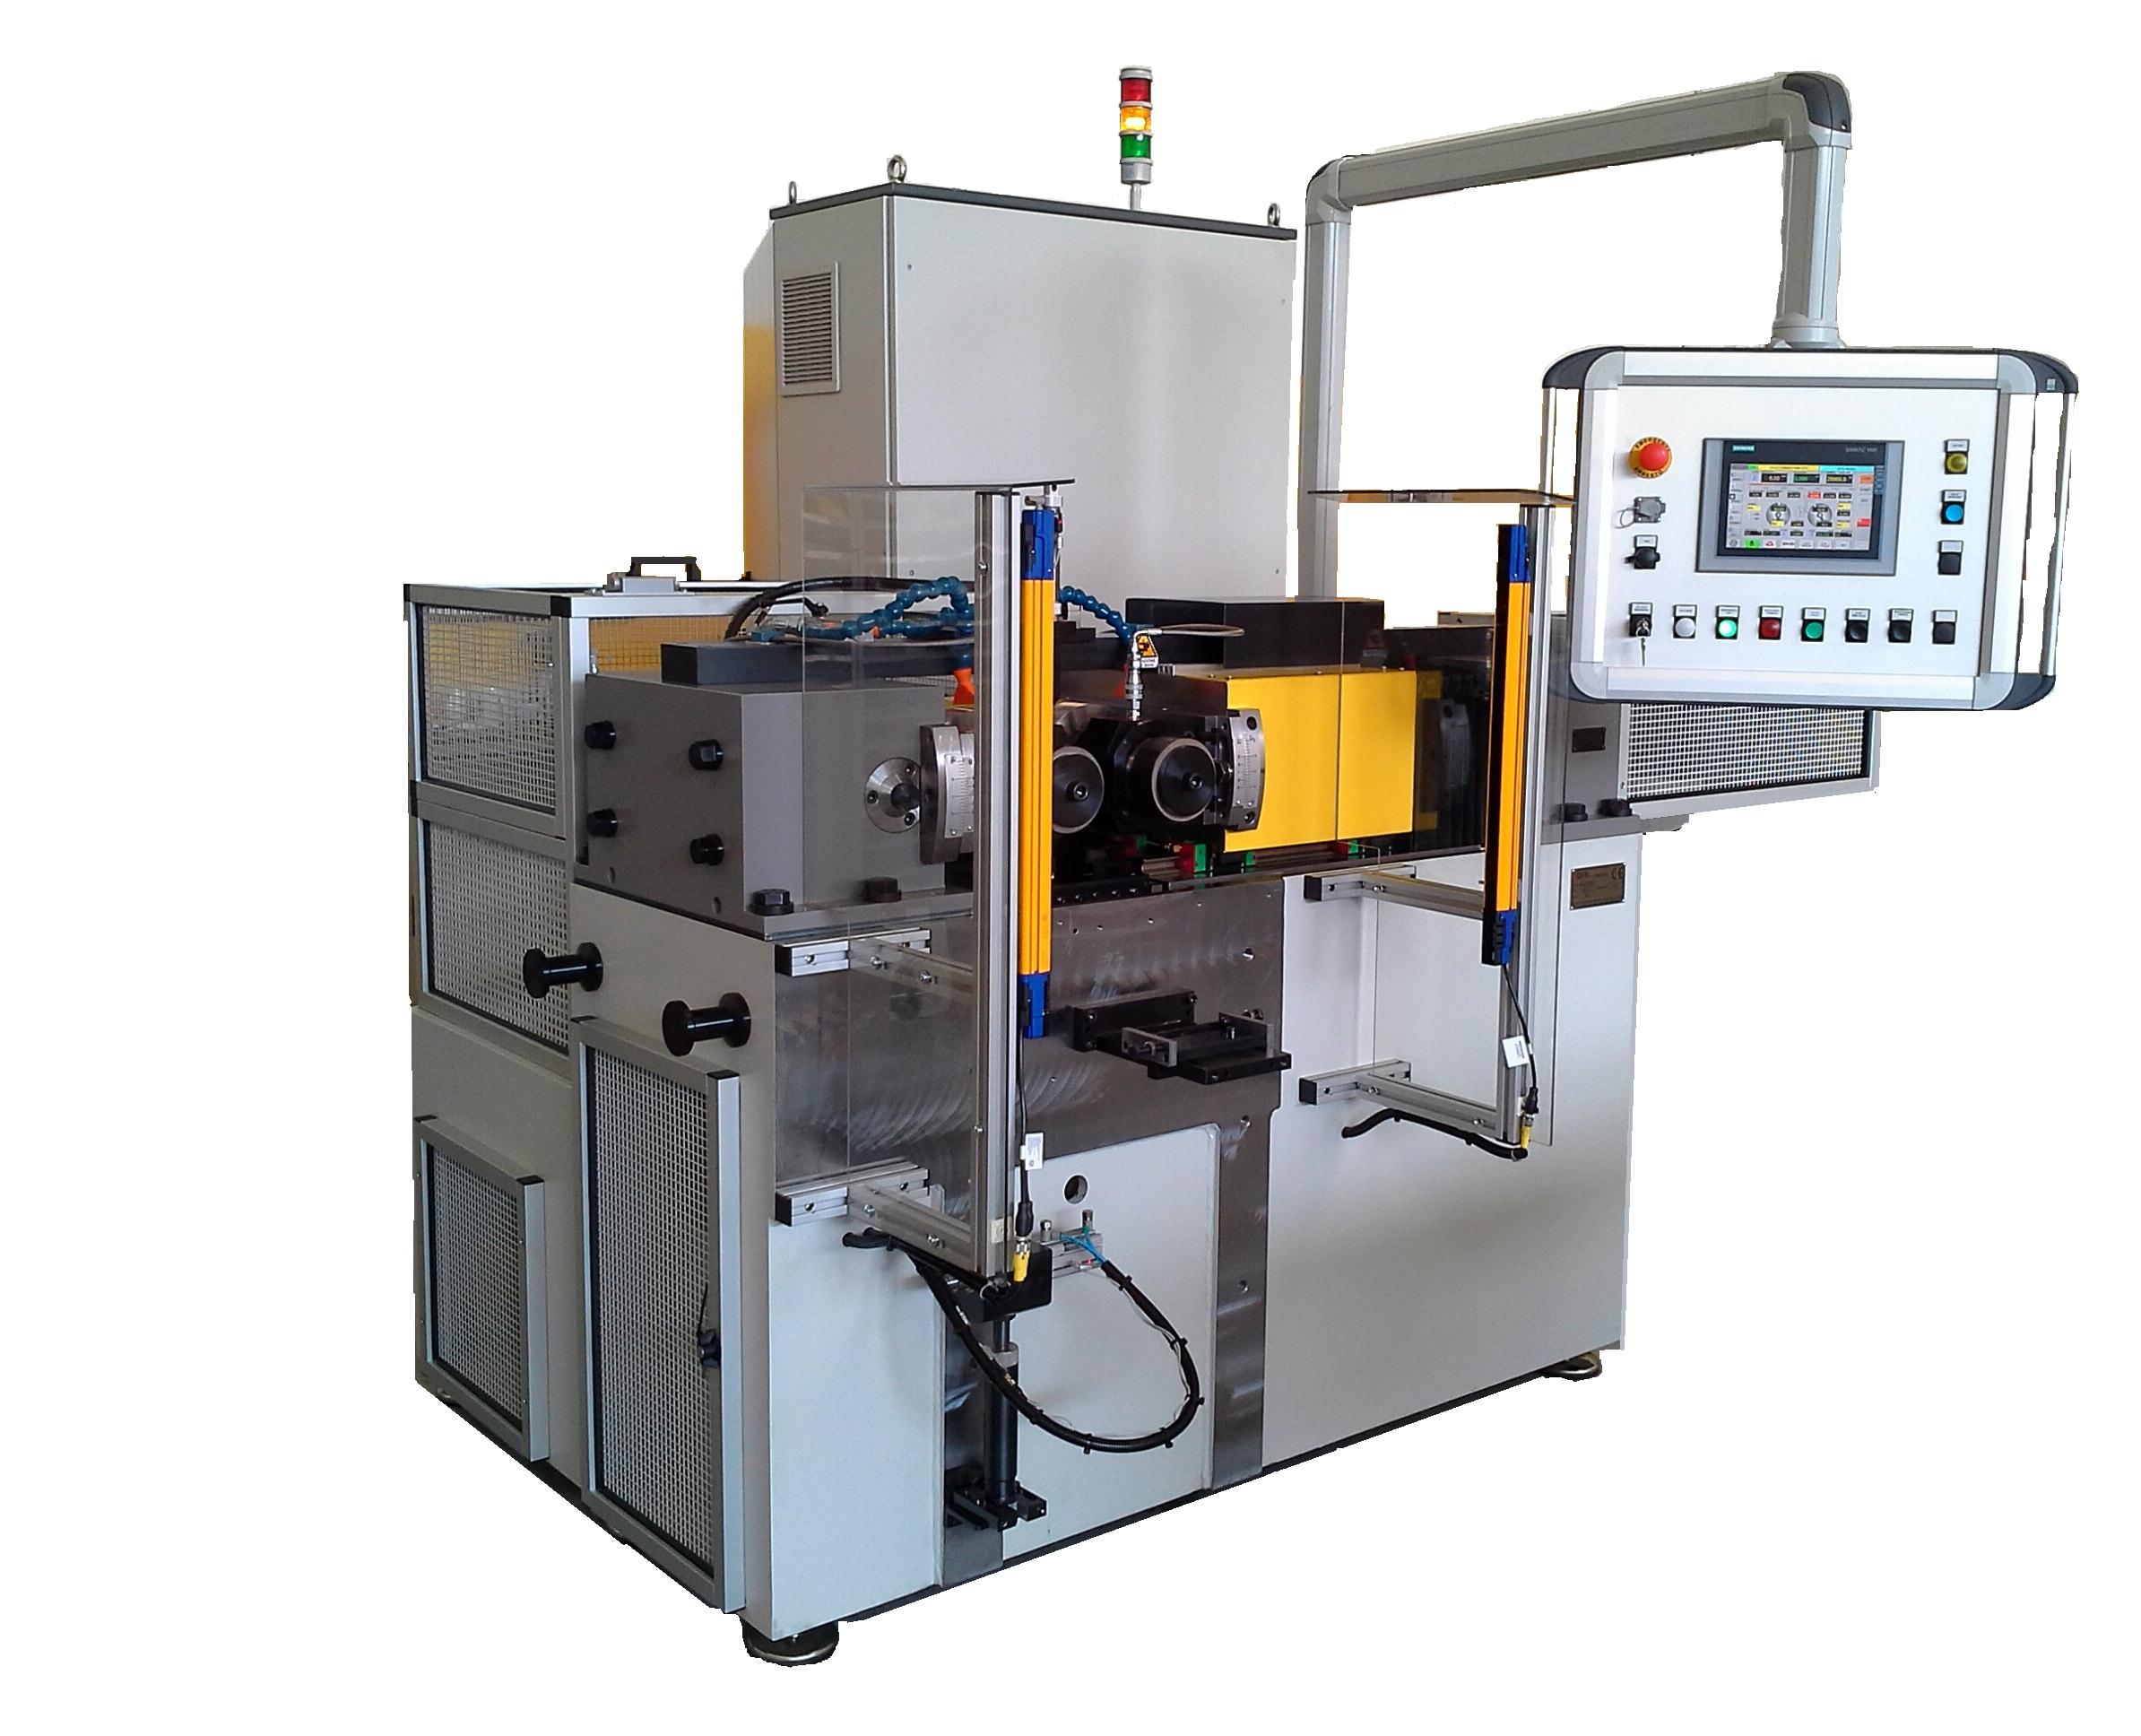 MACCHINE RULLATRICI SERIE CNC-E